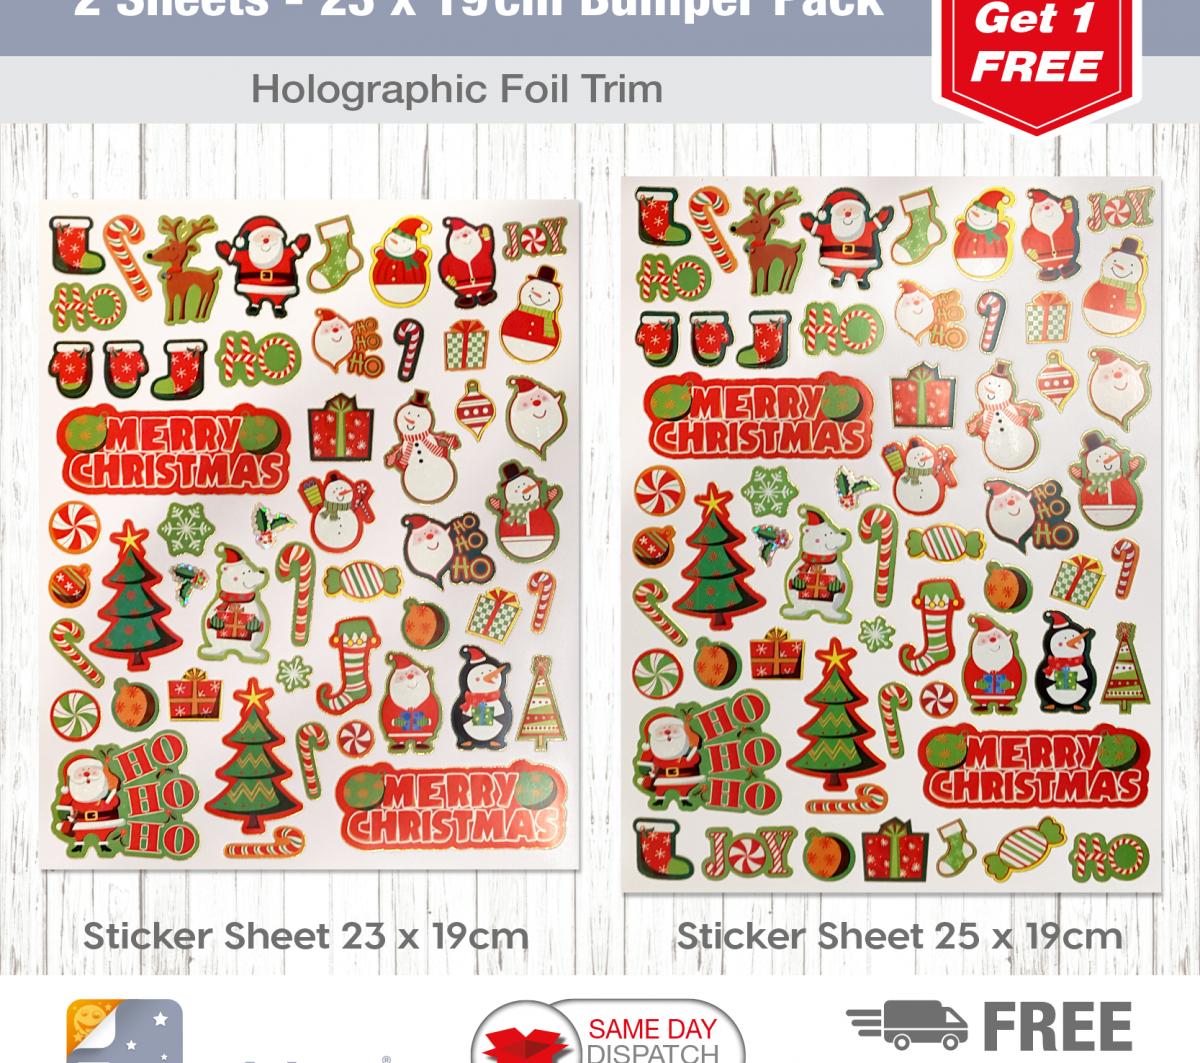 2 Sheet Bumper Pack Christmas Candy-2